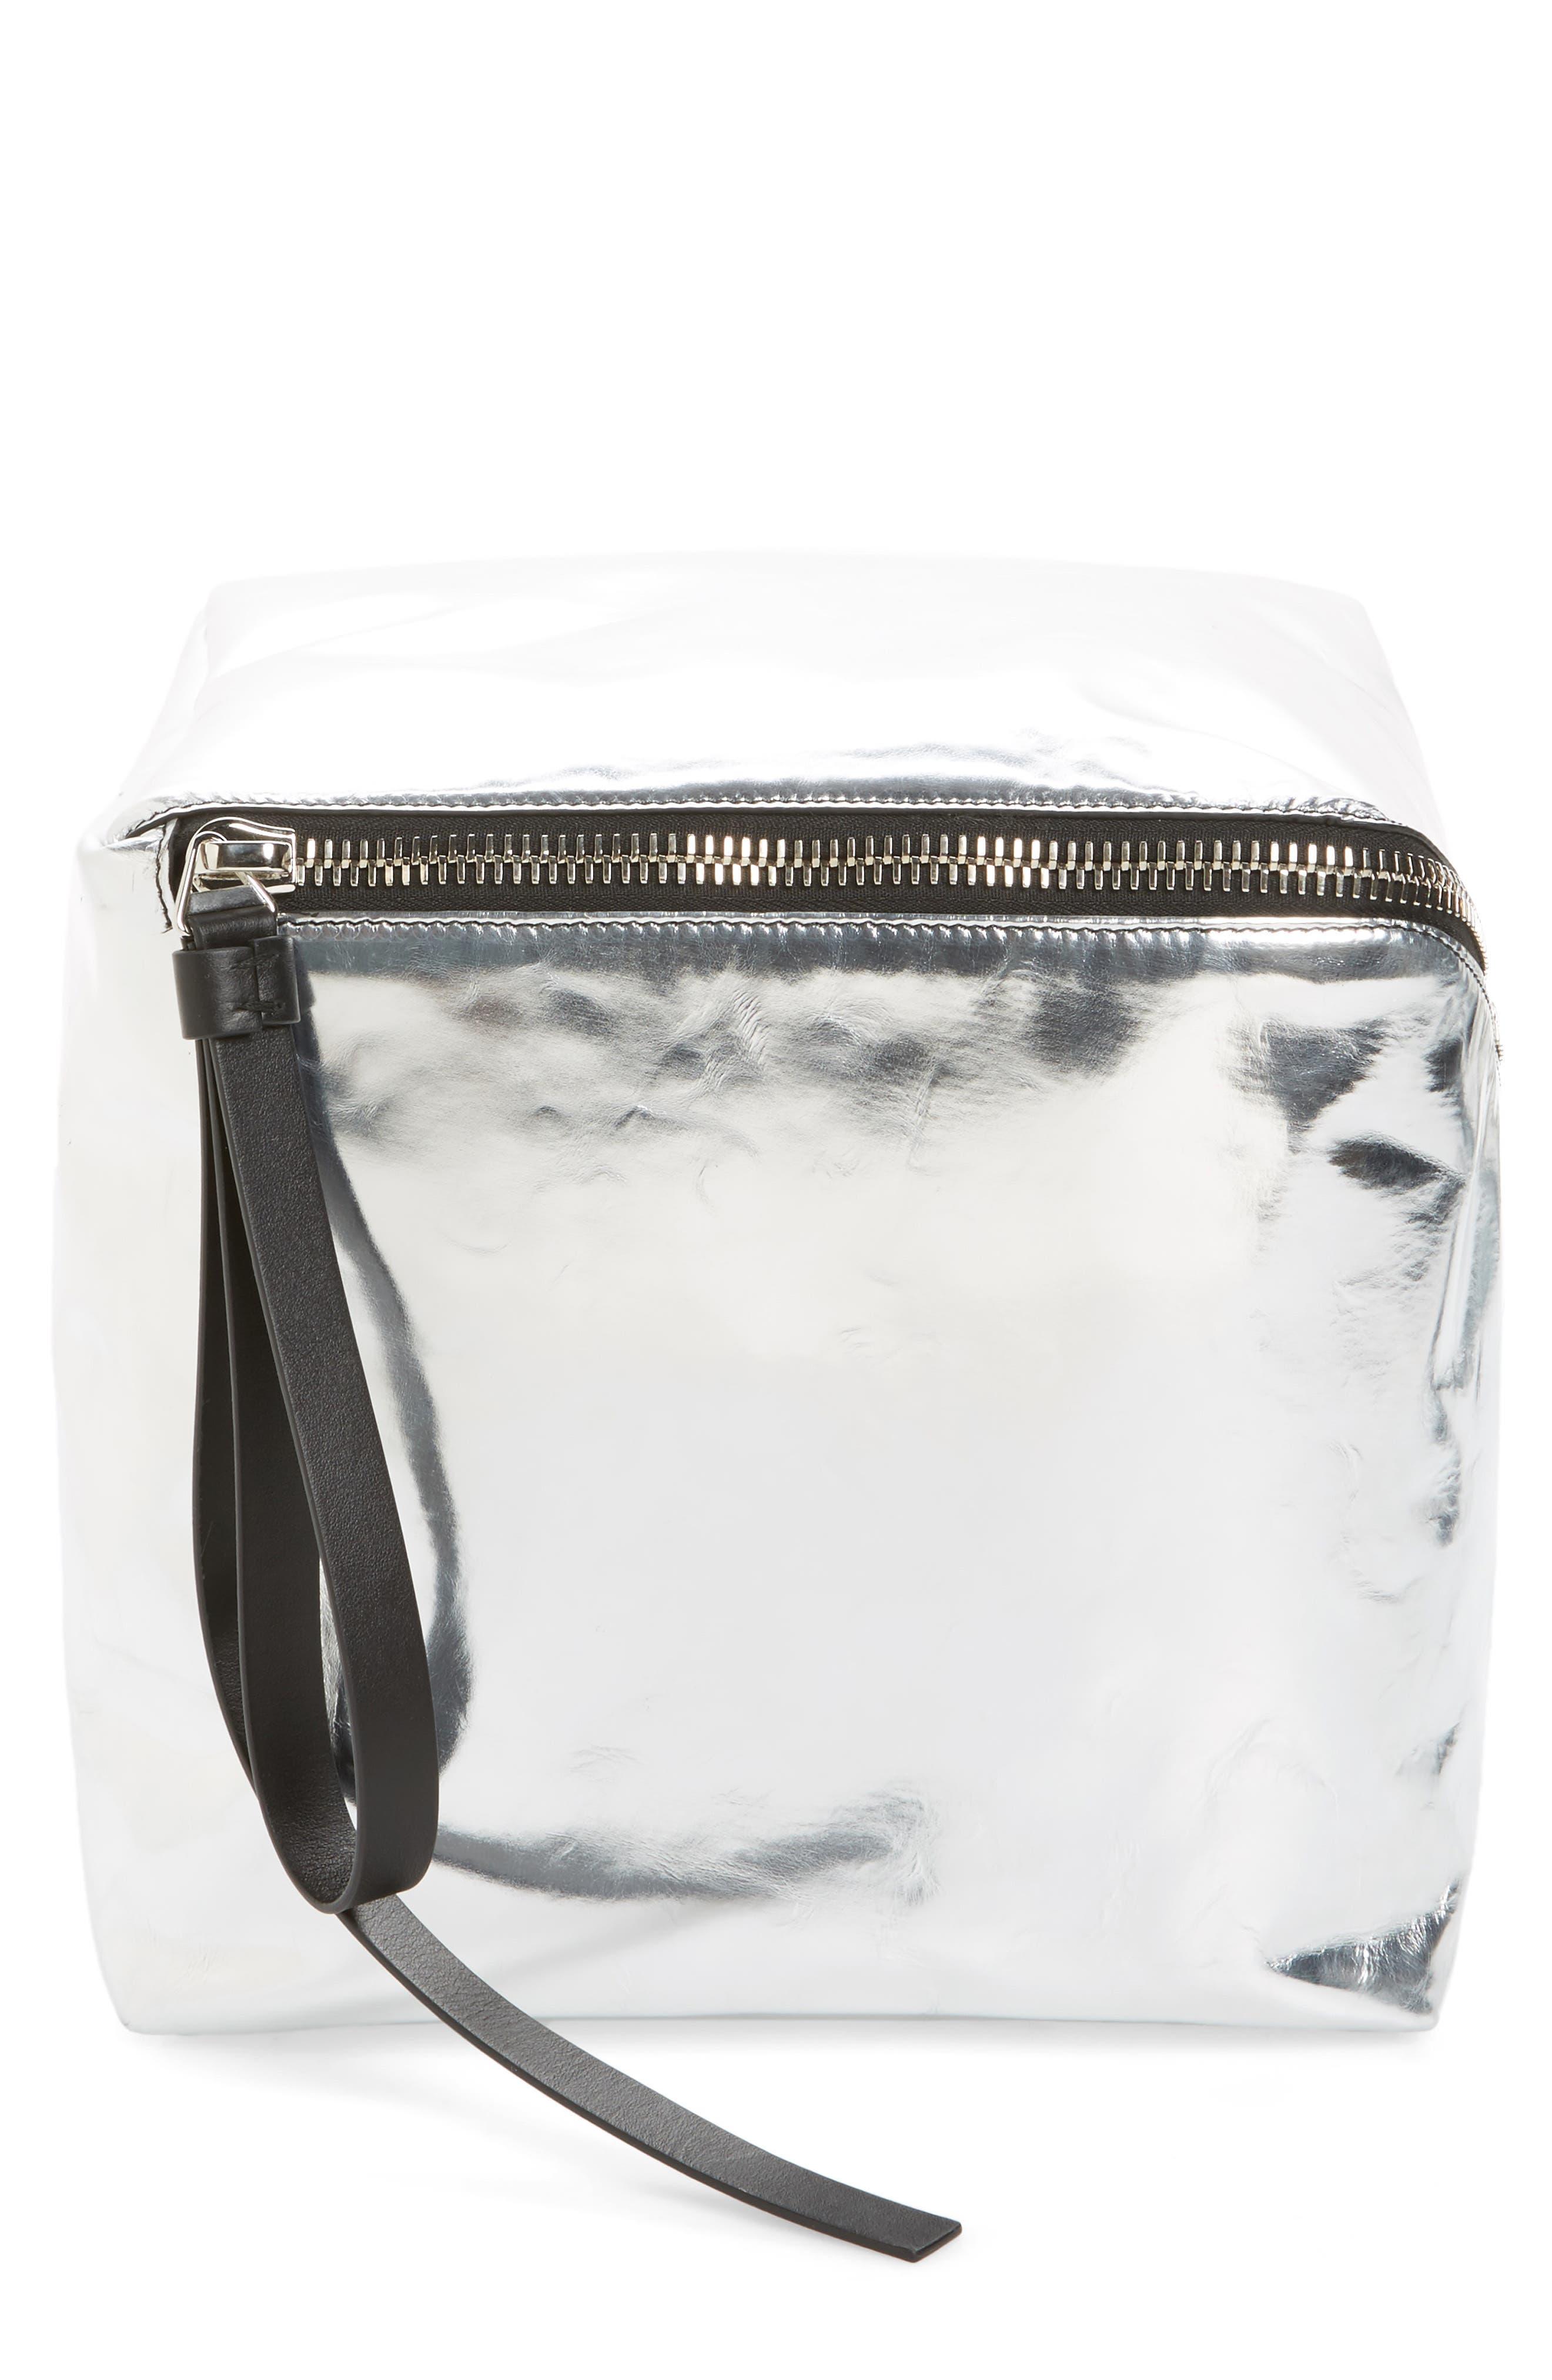 Proenza Schouler Soft Metallic Leather Cube Bag